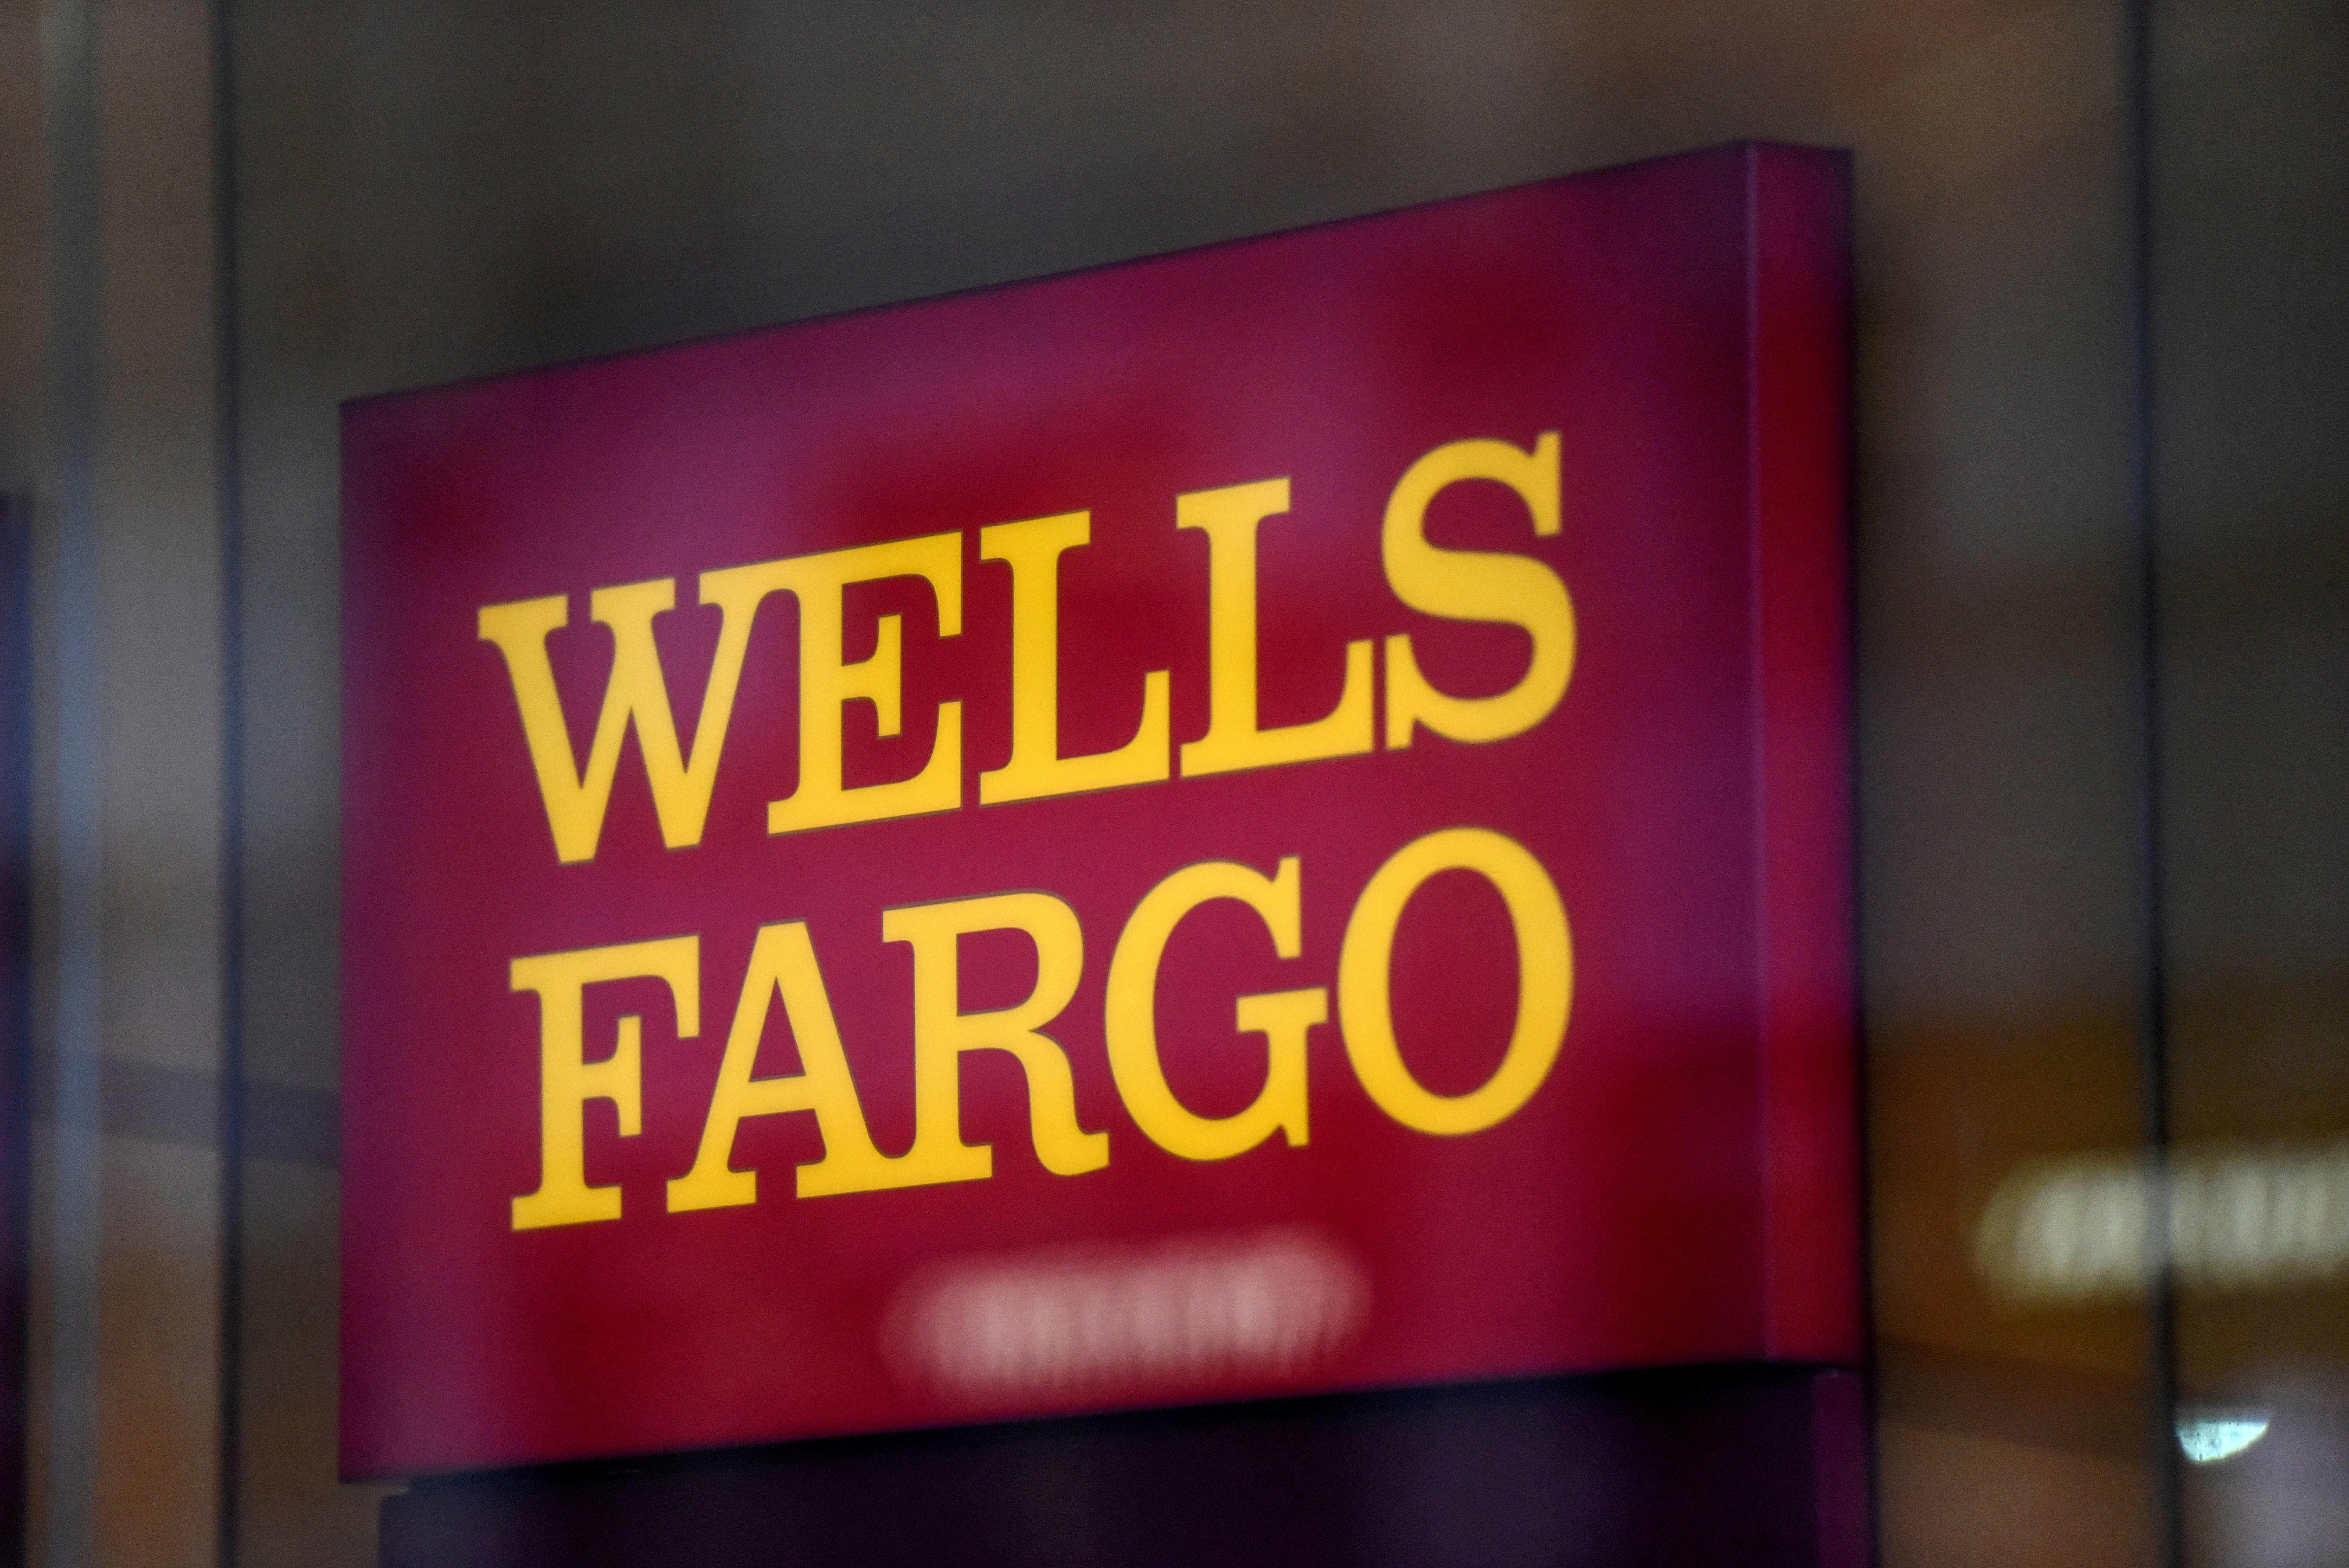 Wells Fargo logo is seen in New York City, U.S. January 10, 2017. REUTERS/Stephanie Keith